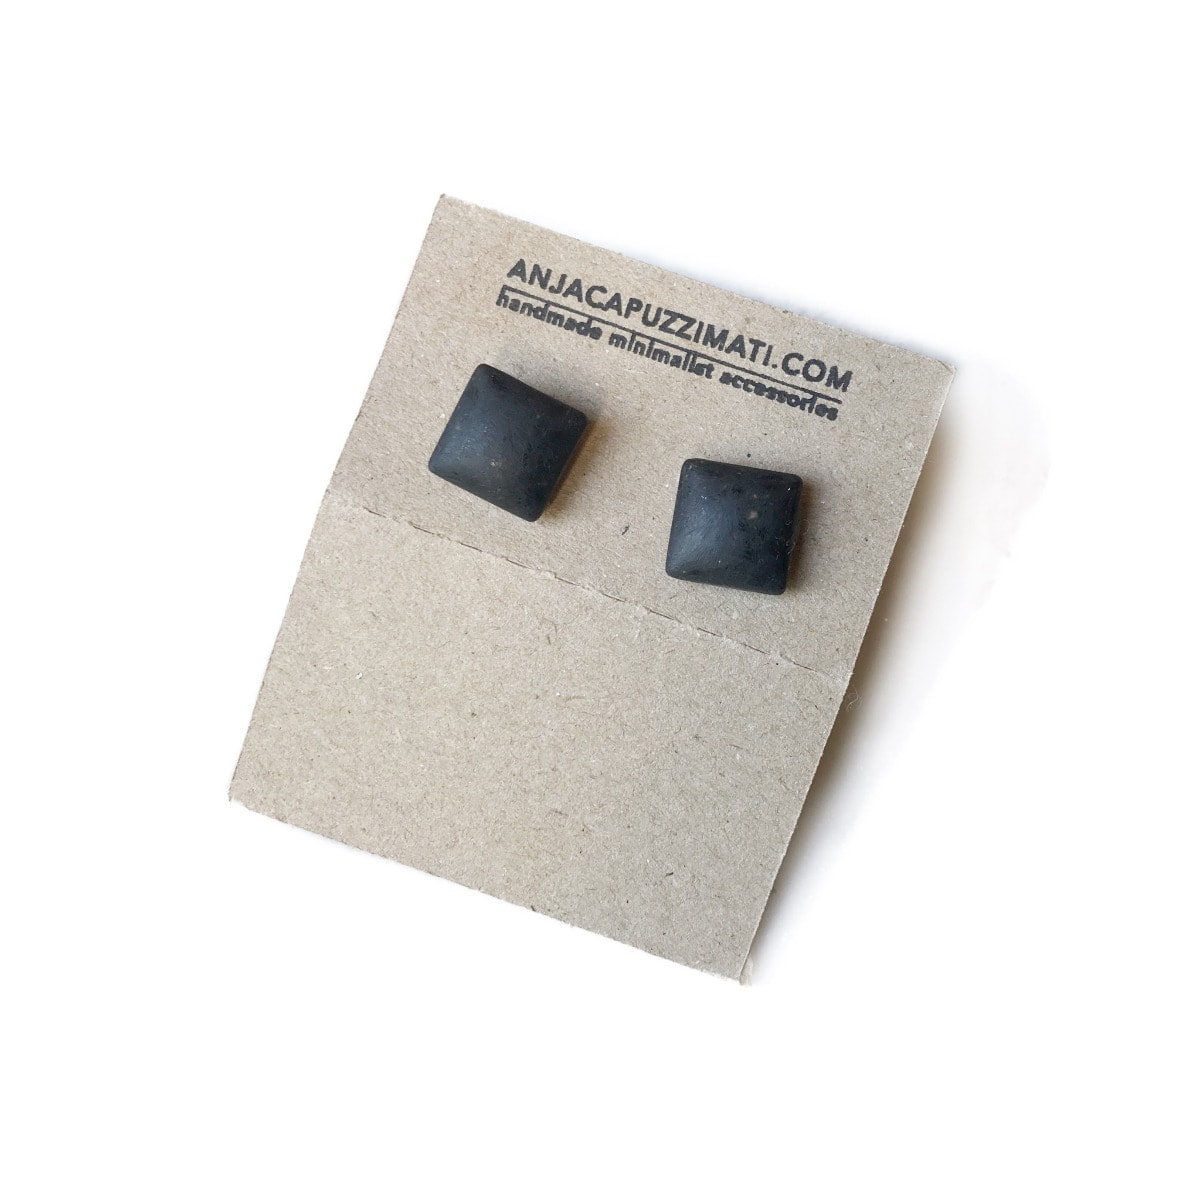 Concrete Minimalist Large Square Cufflinks